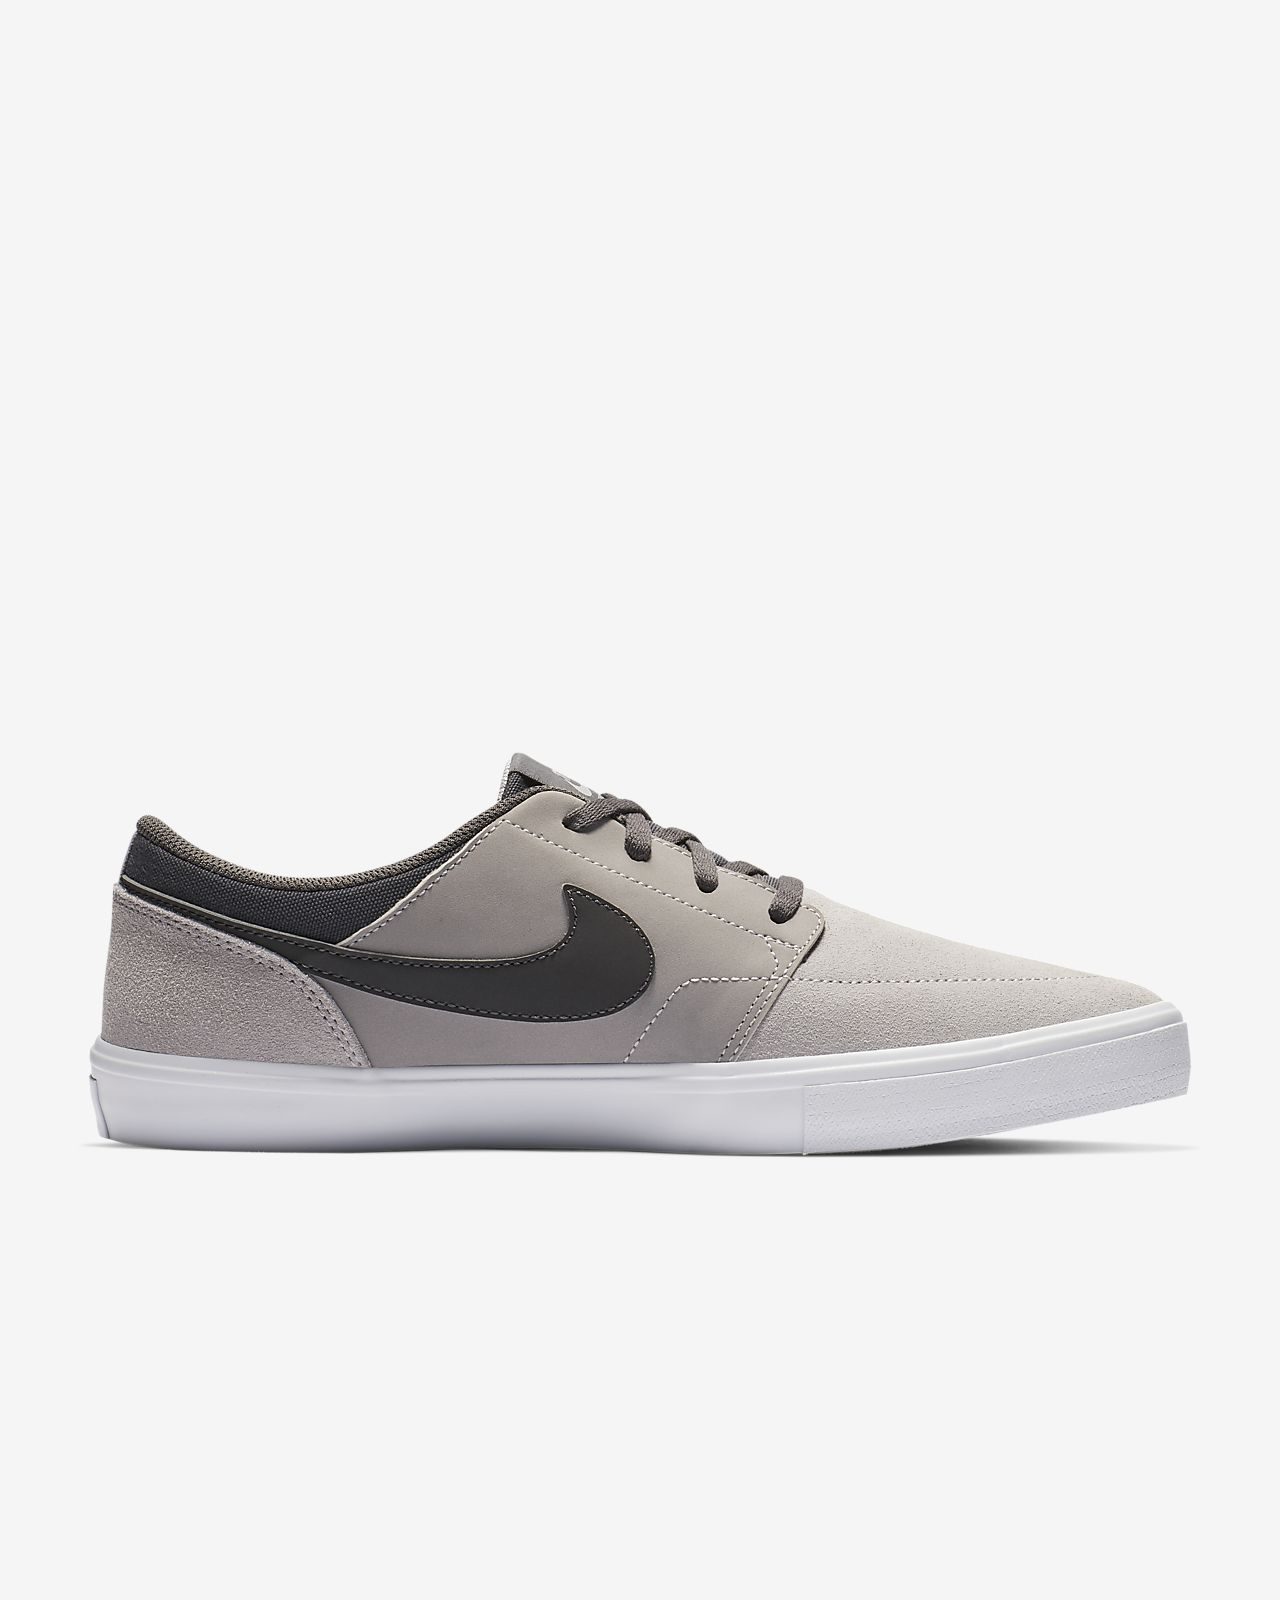 80e718f7c1edd3 Nike SB Solarsoft Portmore II Men s Skateboarding Shoe. Nike.com AU